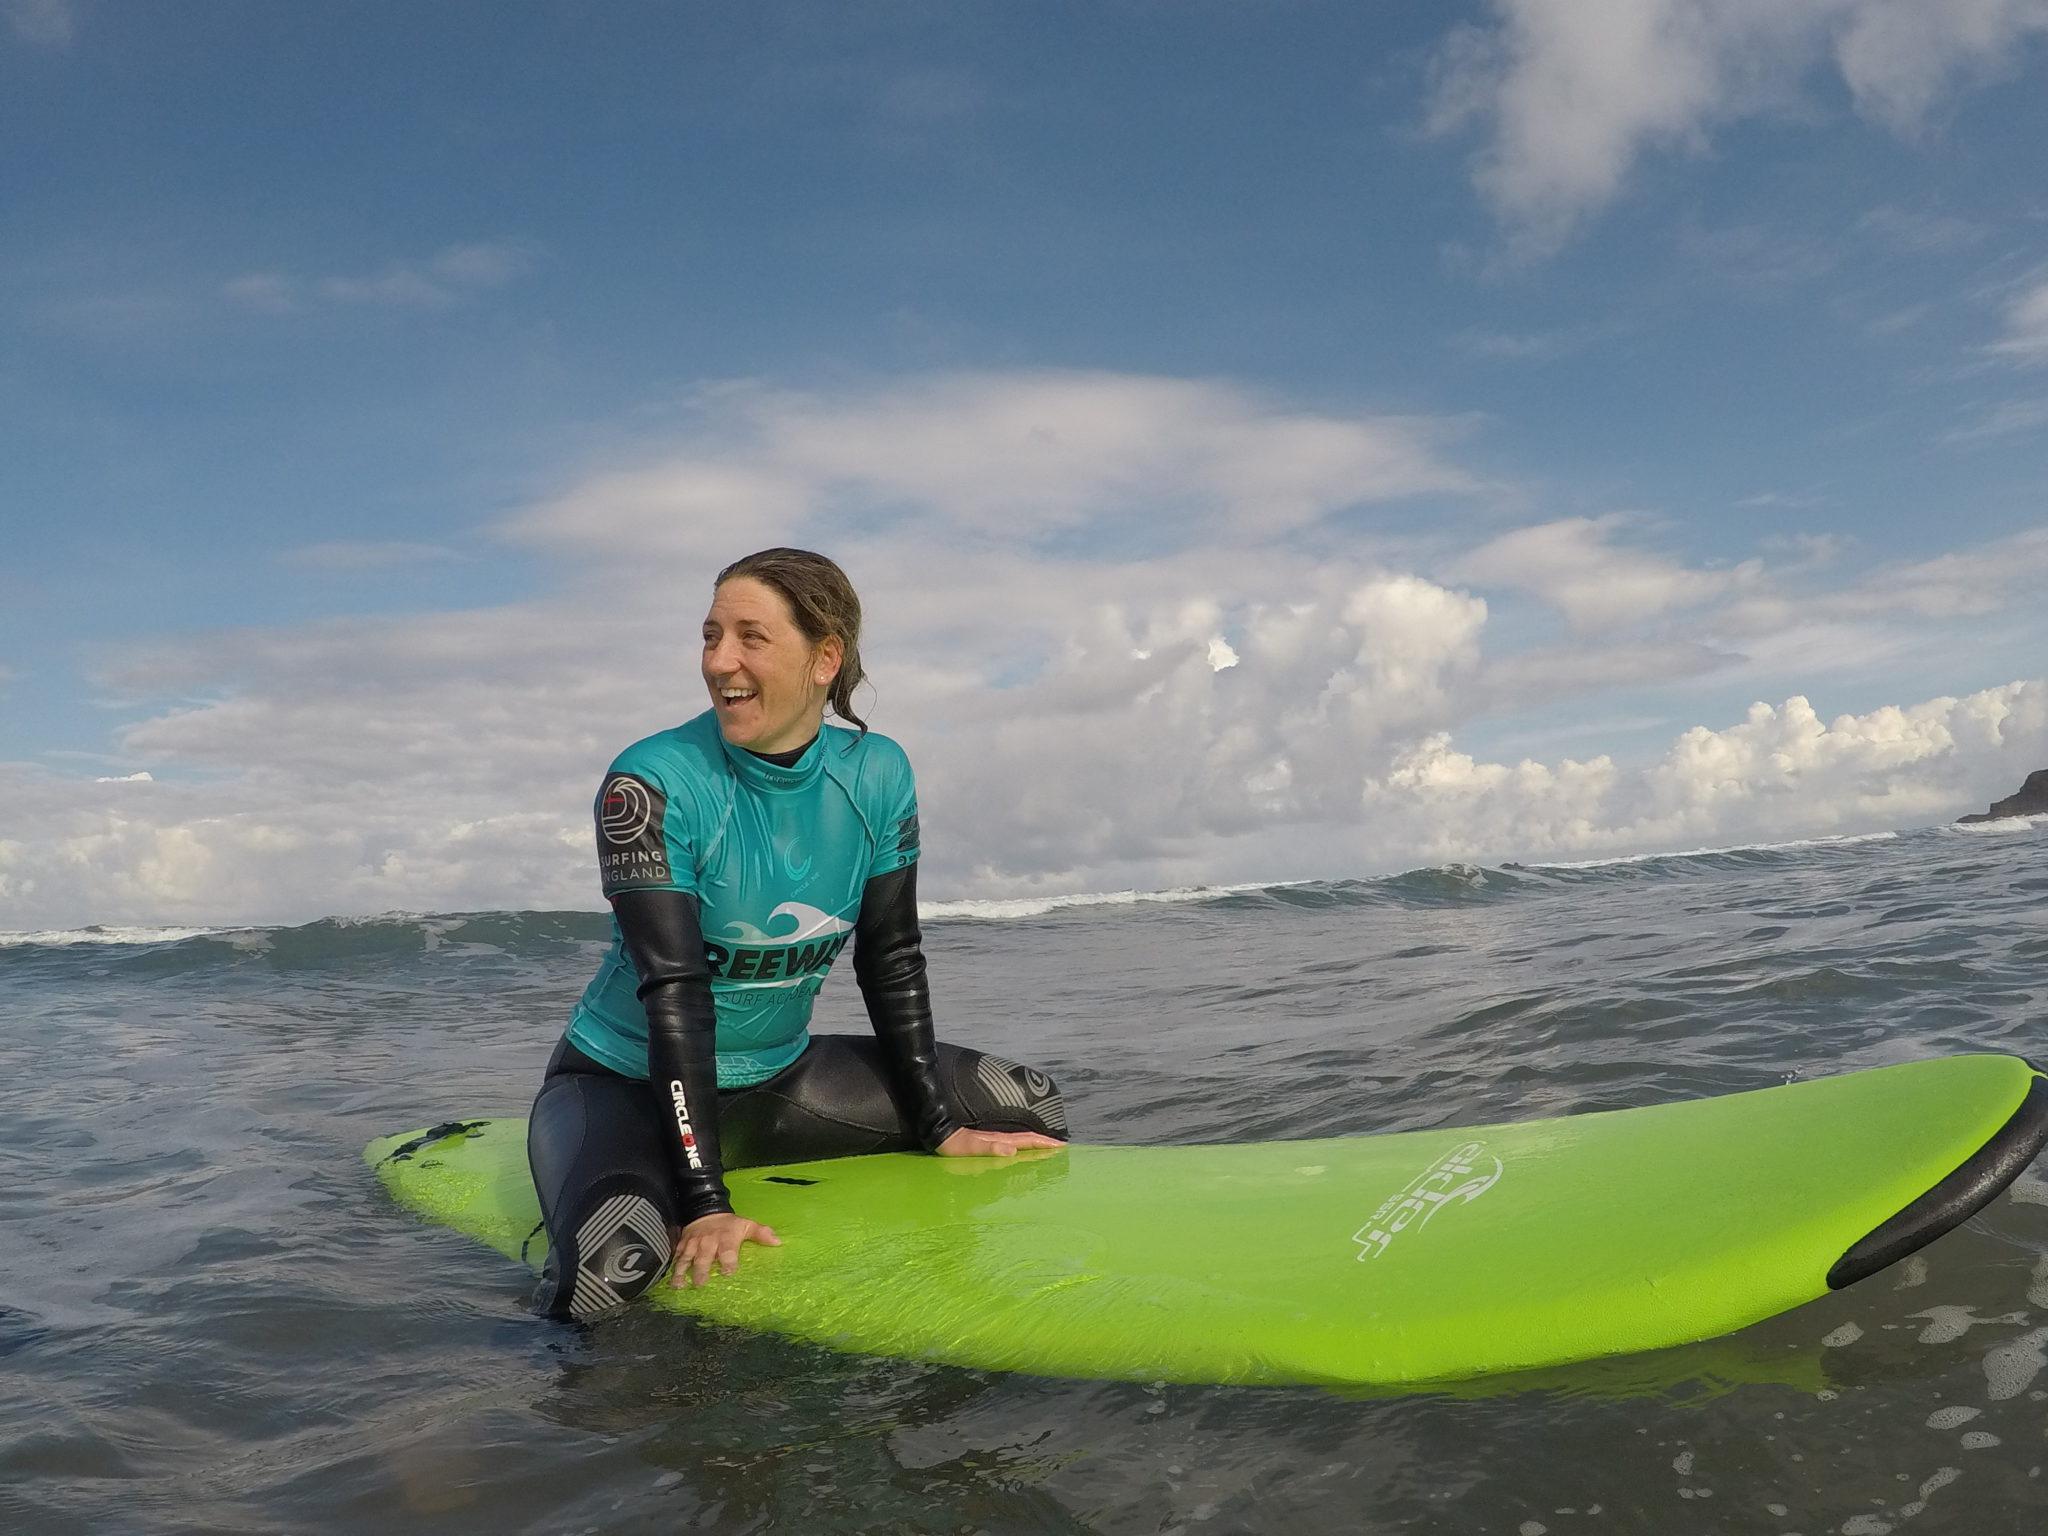 Cornwall beginner surfing experience at Widemouth Bay Beach